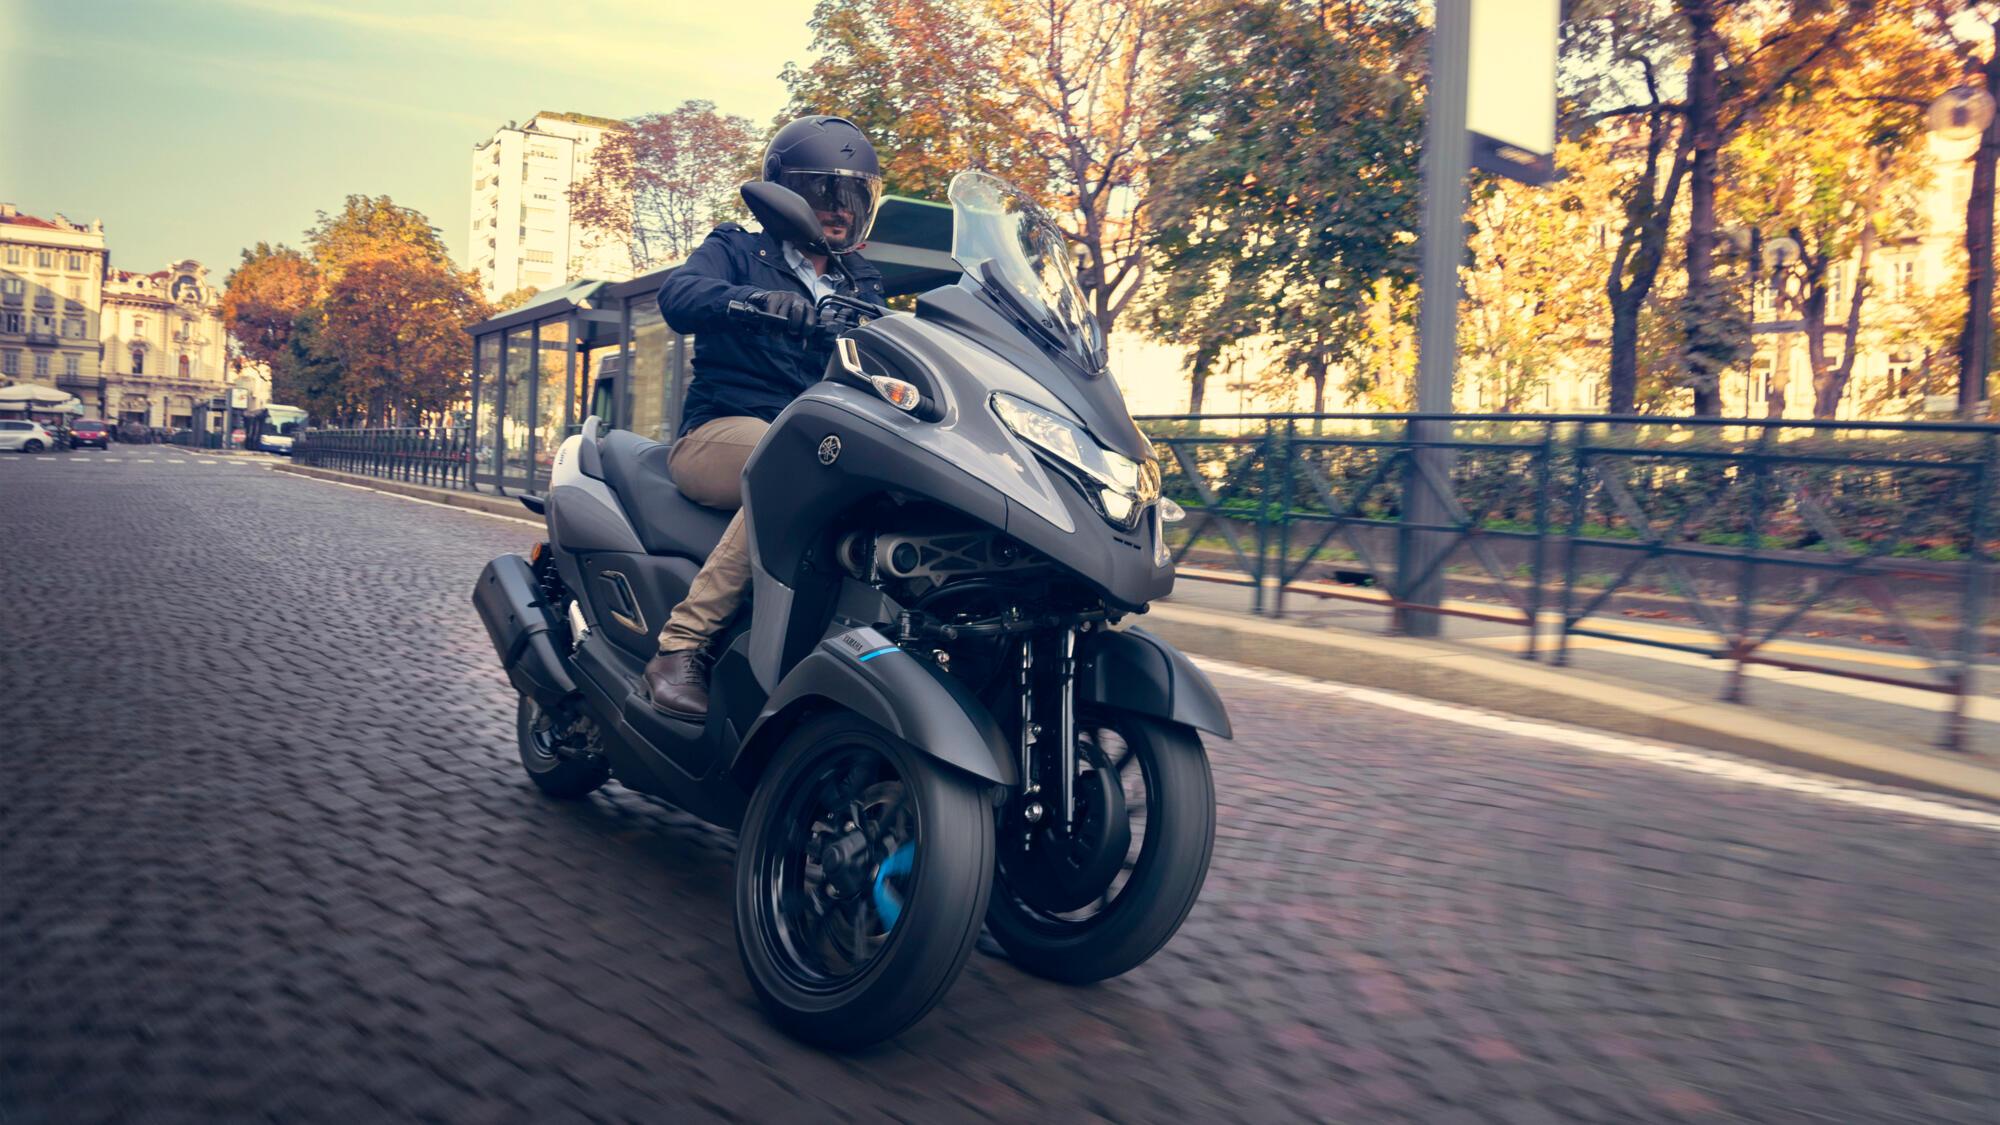 Yamaha Tricity 300 2020 | MotorCentrumWest